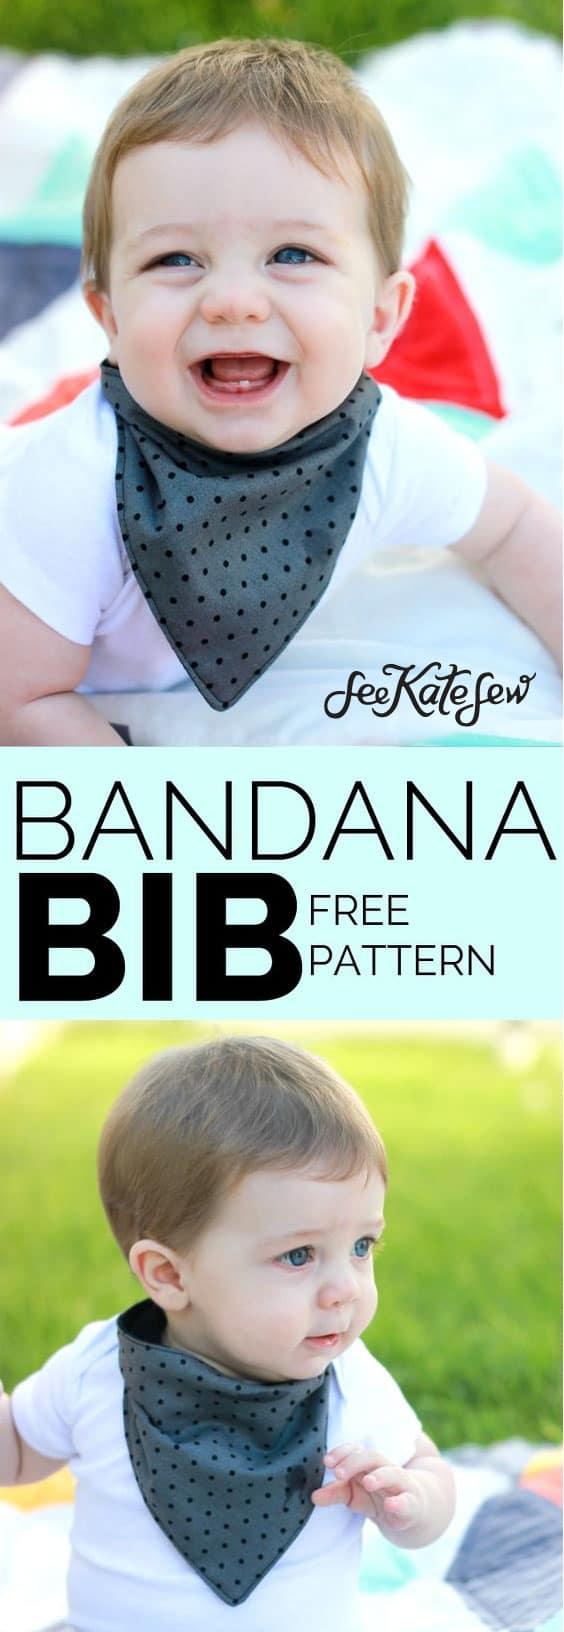 Bandana Bib Tutorial | See Kate Sew